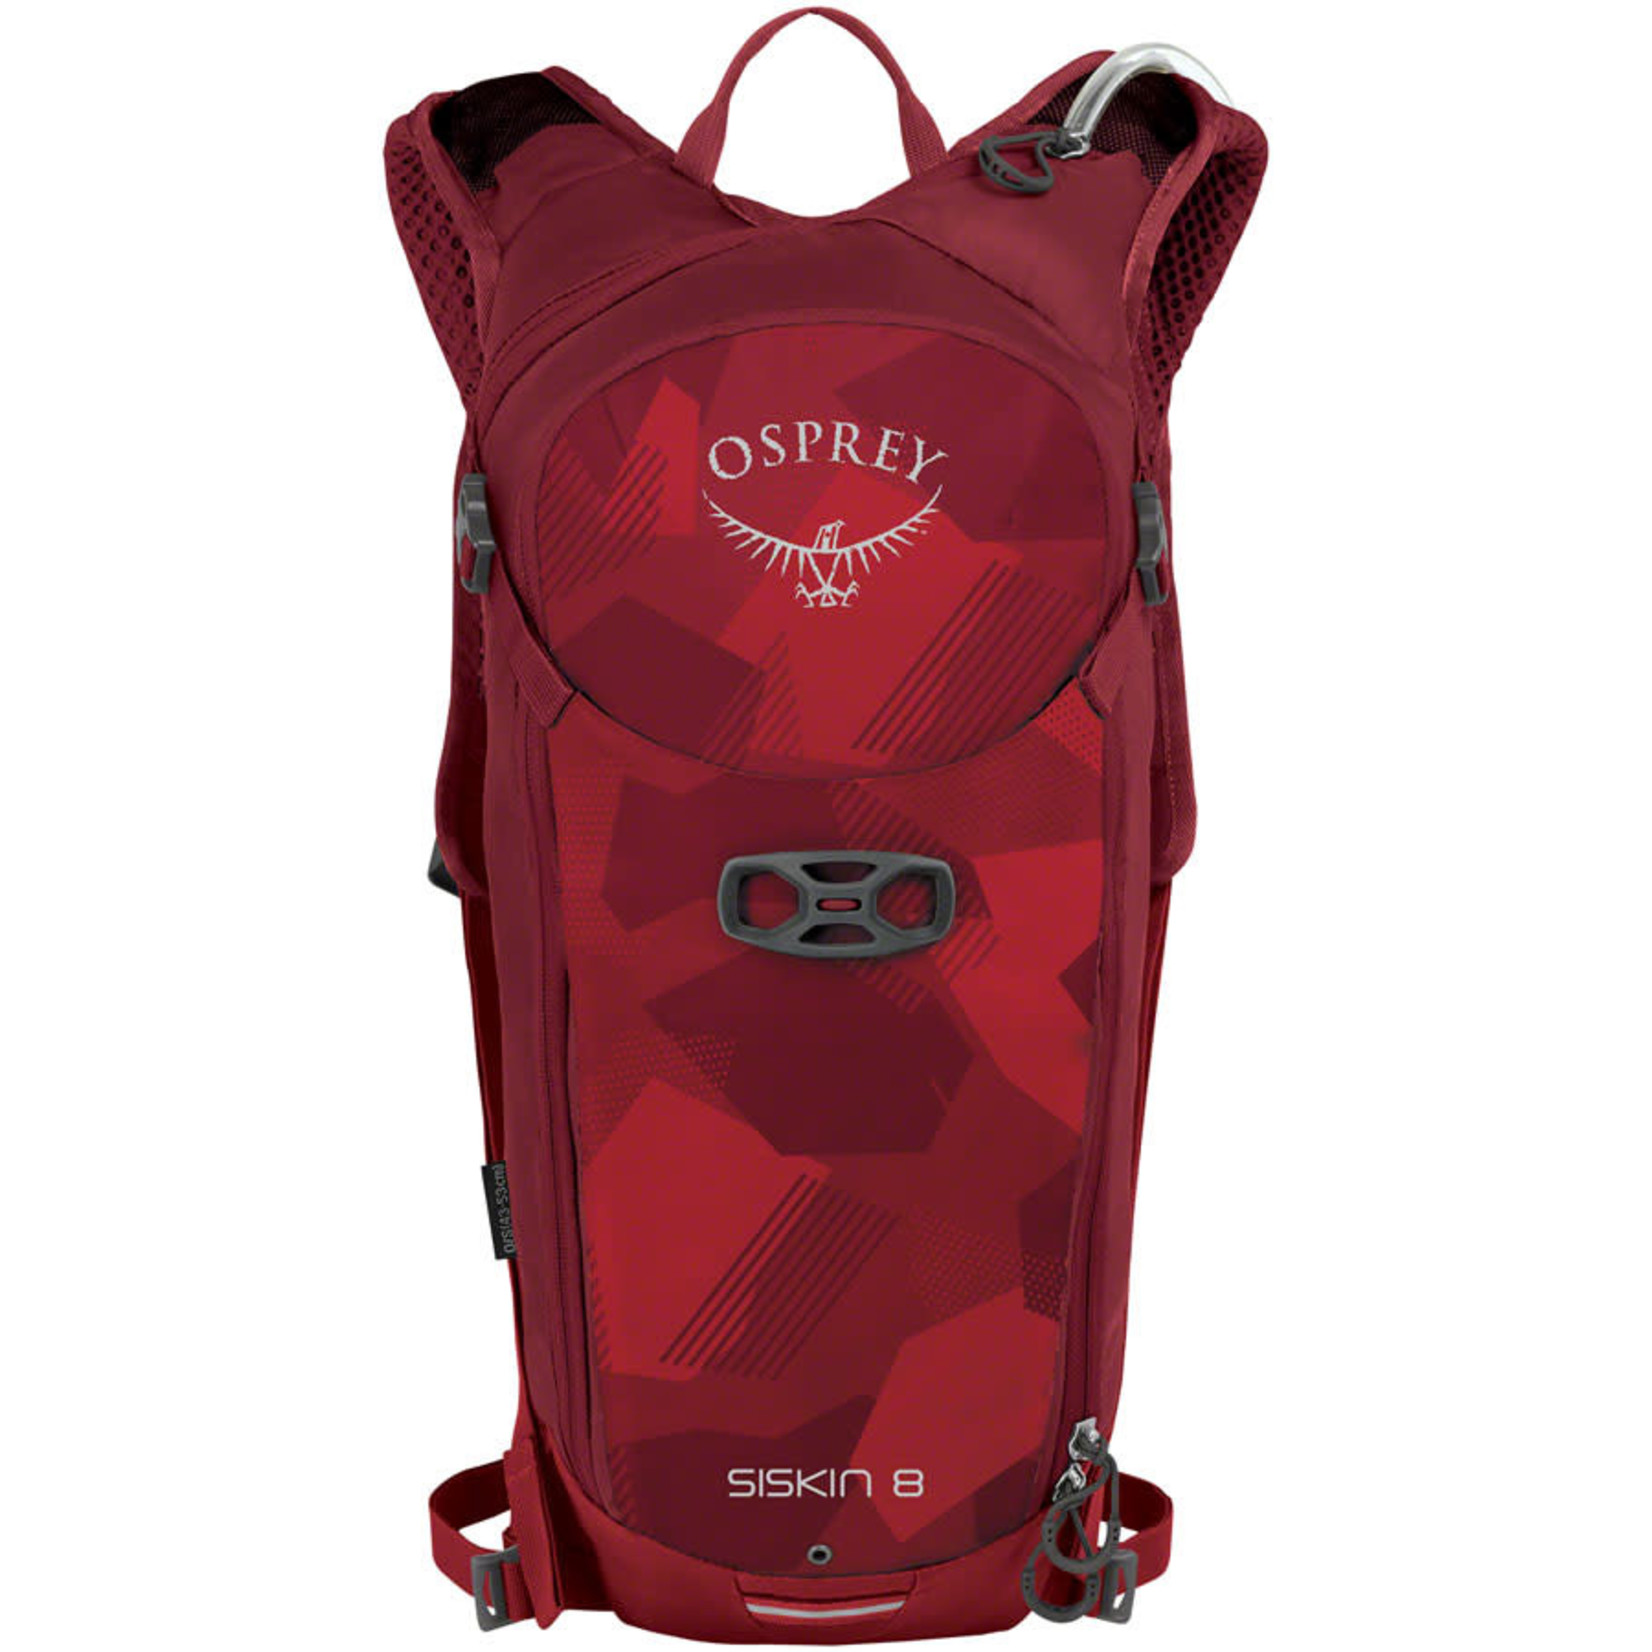 Osprey Siskin 8 Hydration Pack - Molten Red